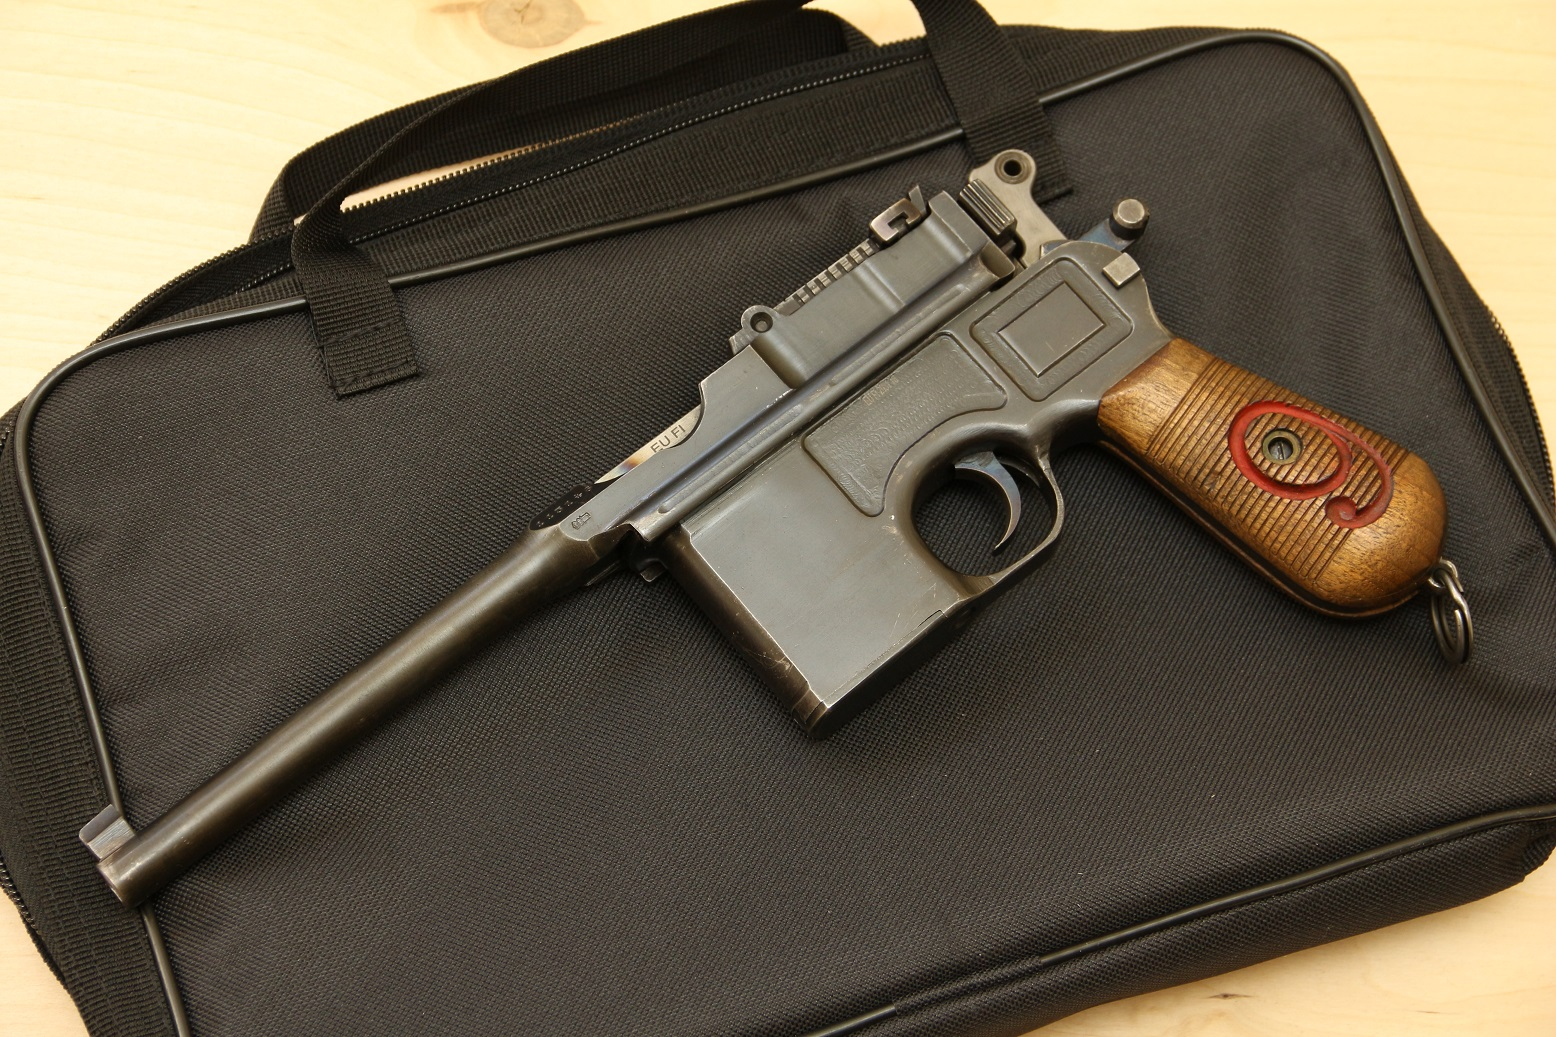 Фото Mauser C96 Красная Девятка #113146